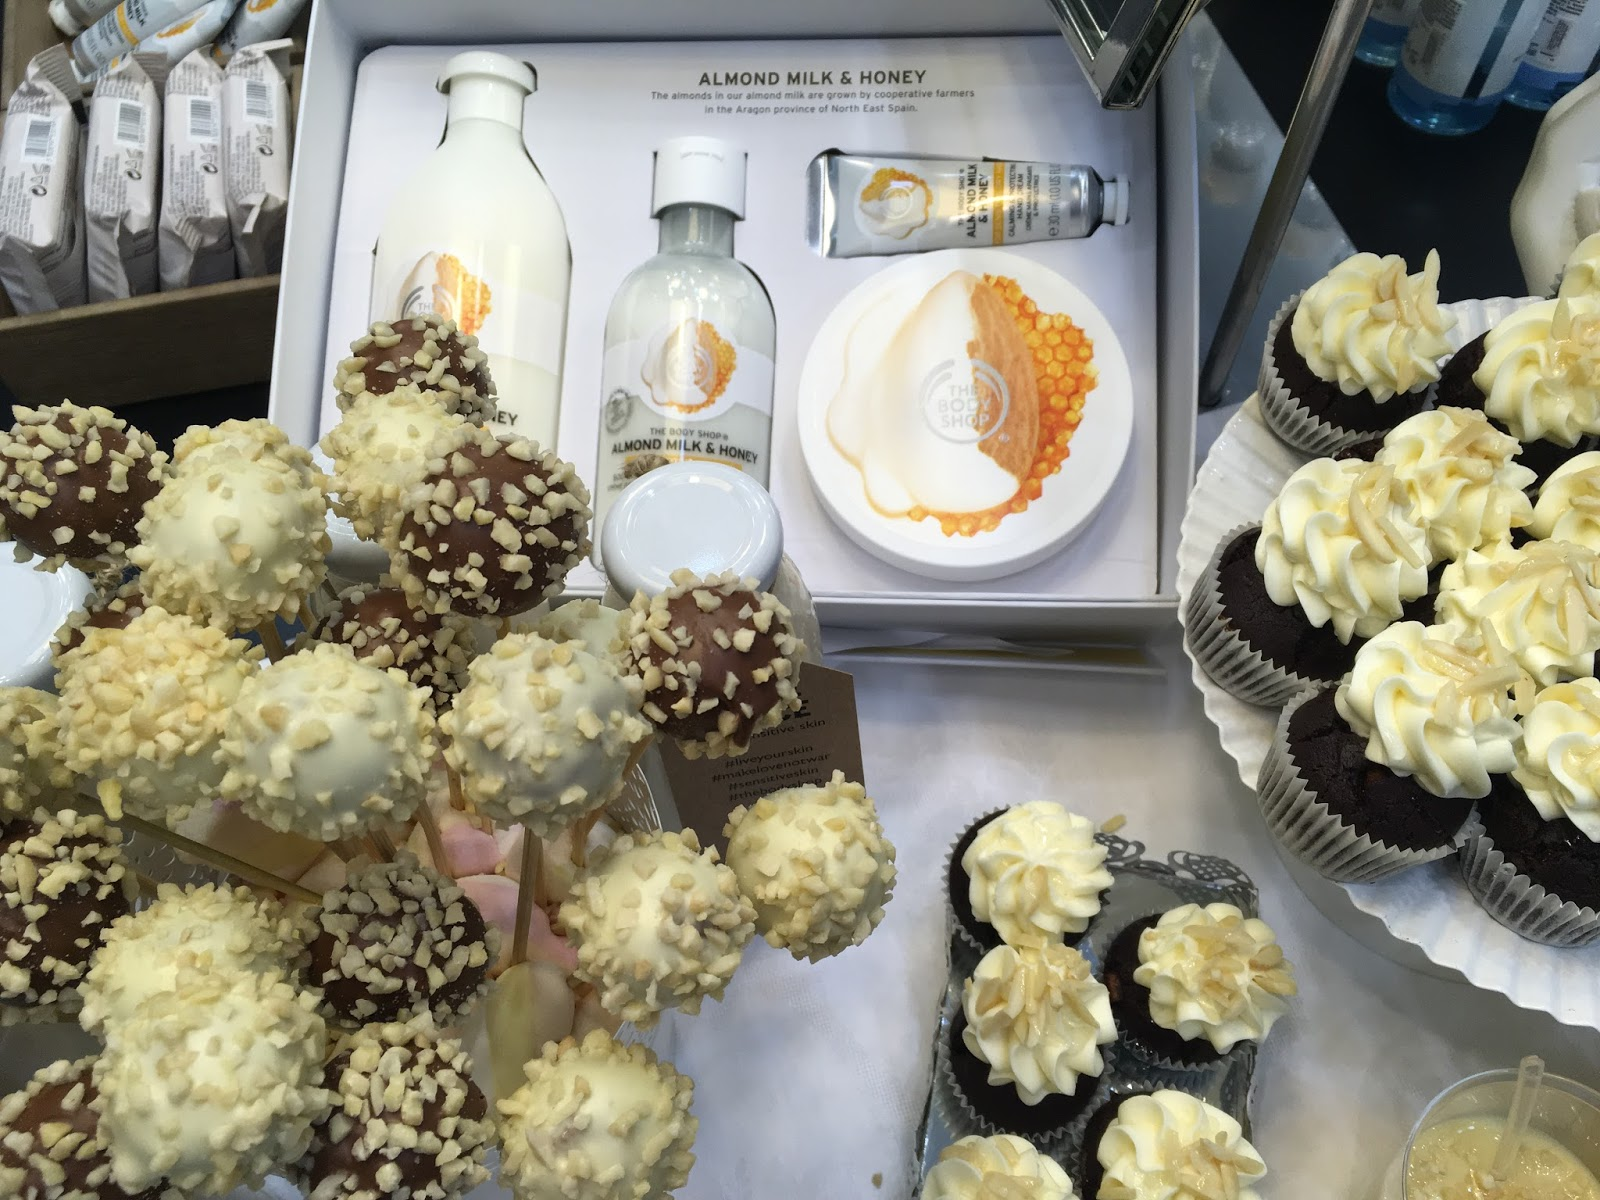 Almond Milk&Honey by The Body Shop